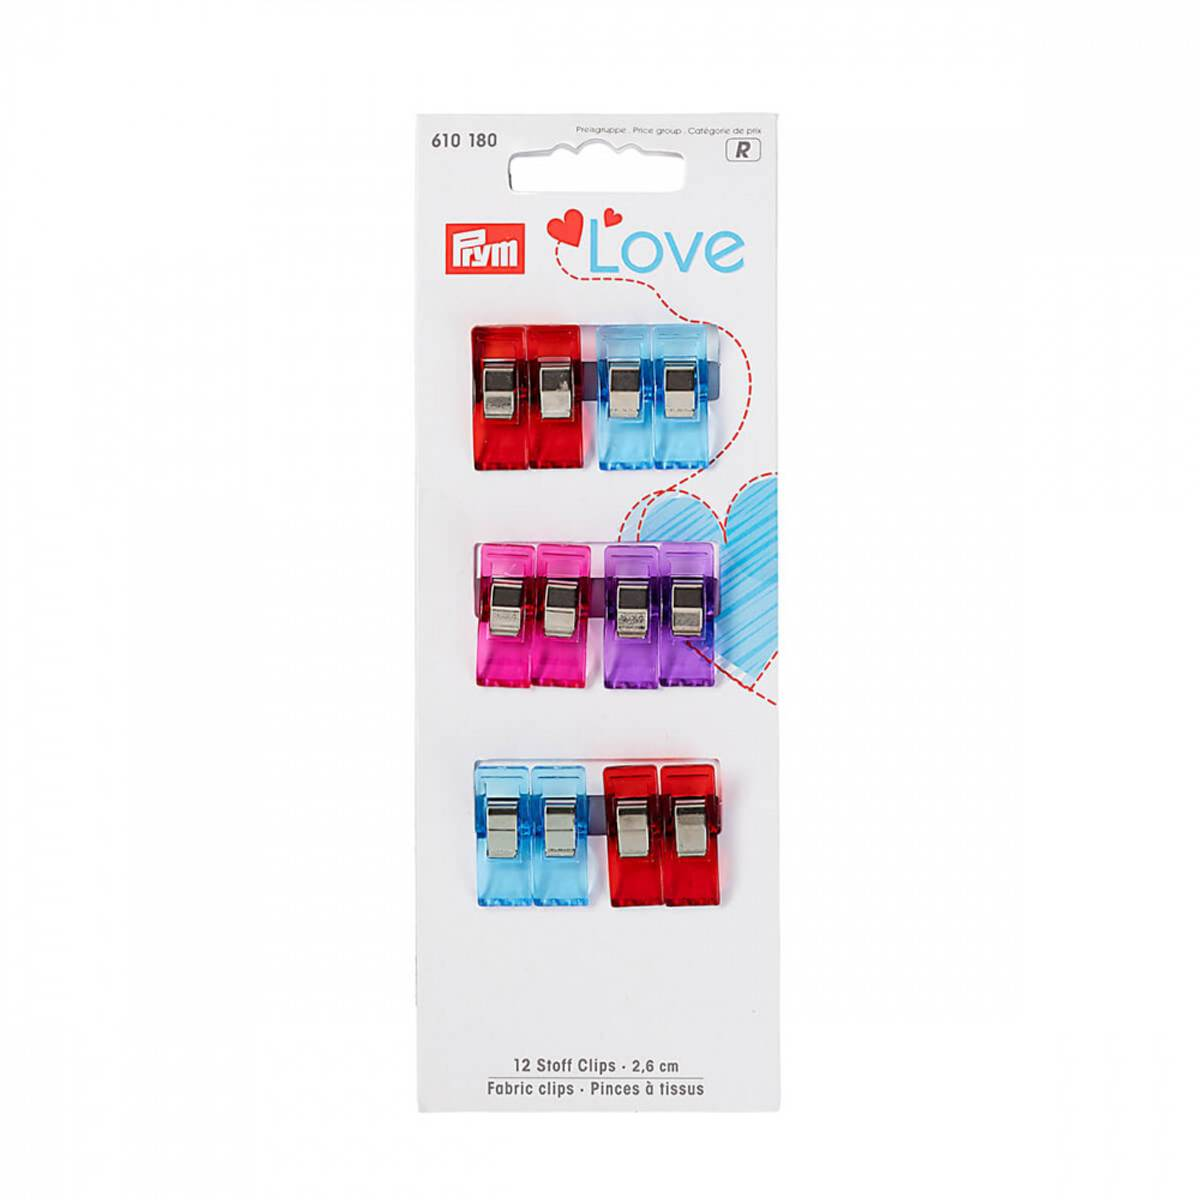 Prym Love 12 clips 610180